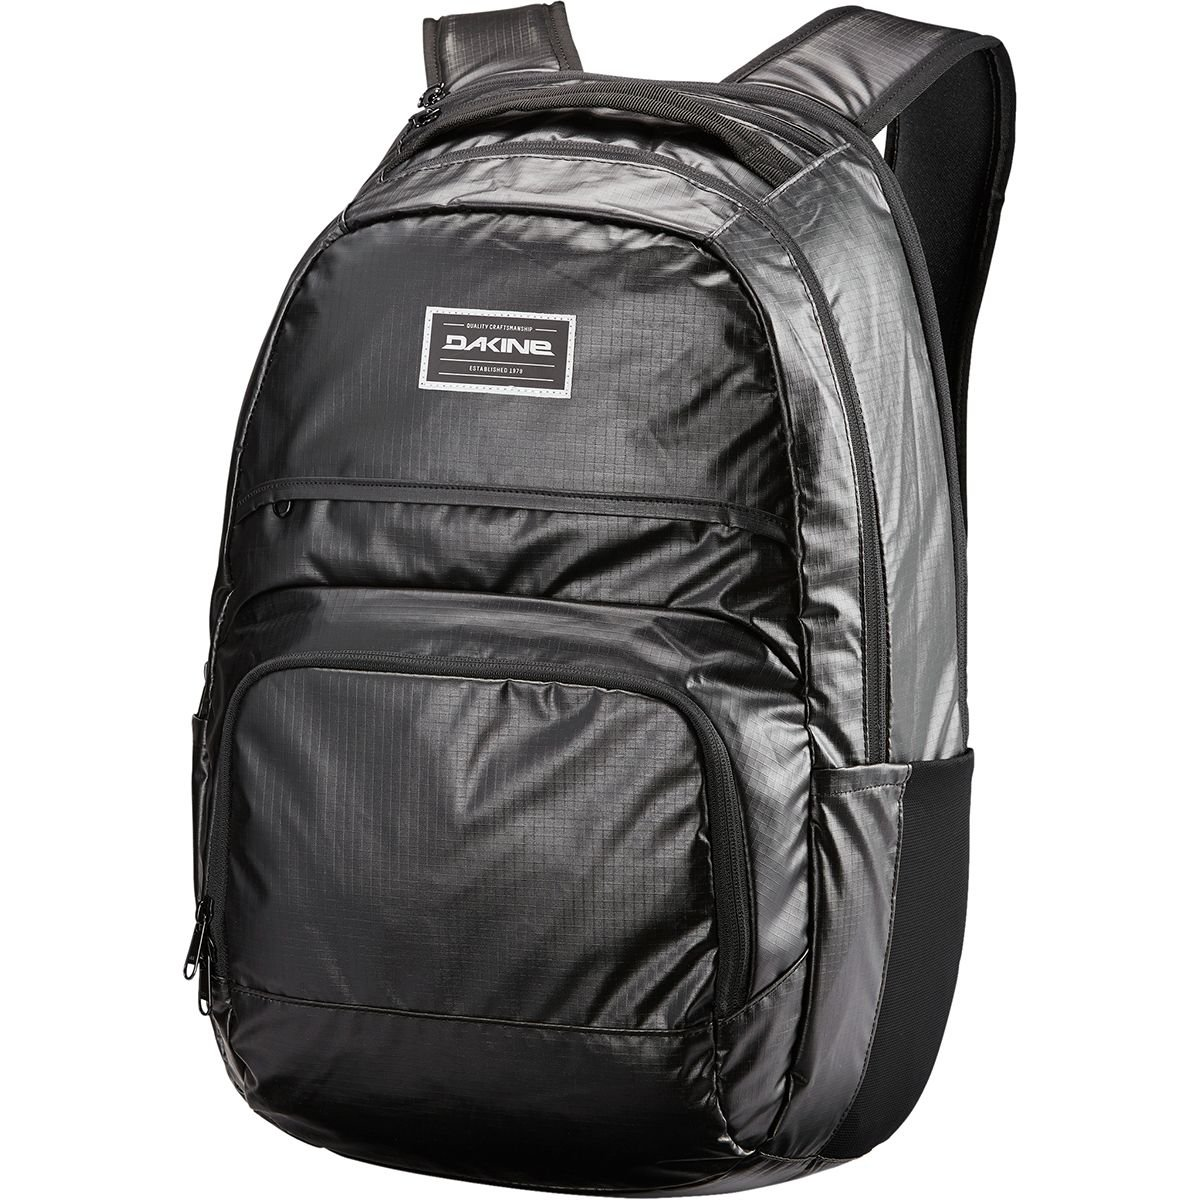 Dakine Campus Large 33l Unisex Rucksack Black One Size